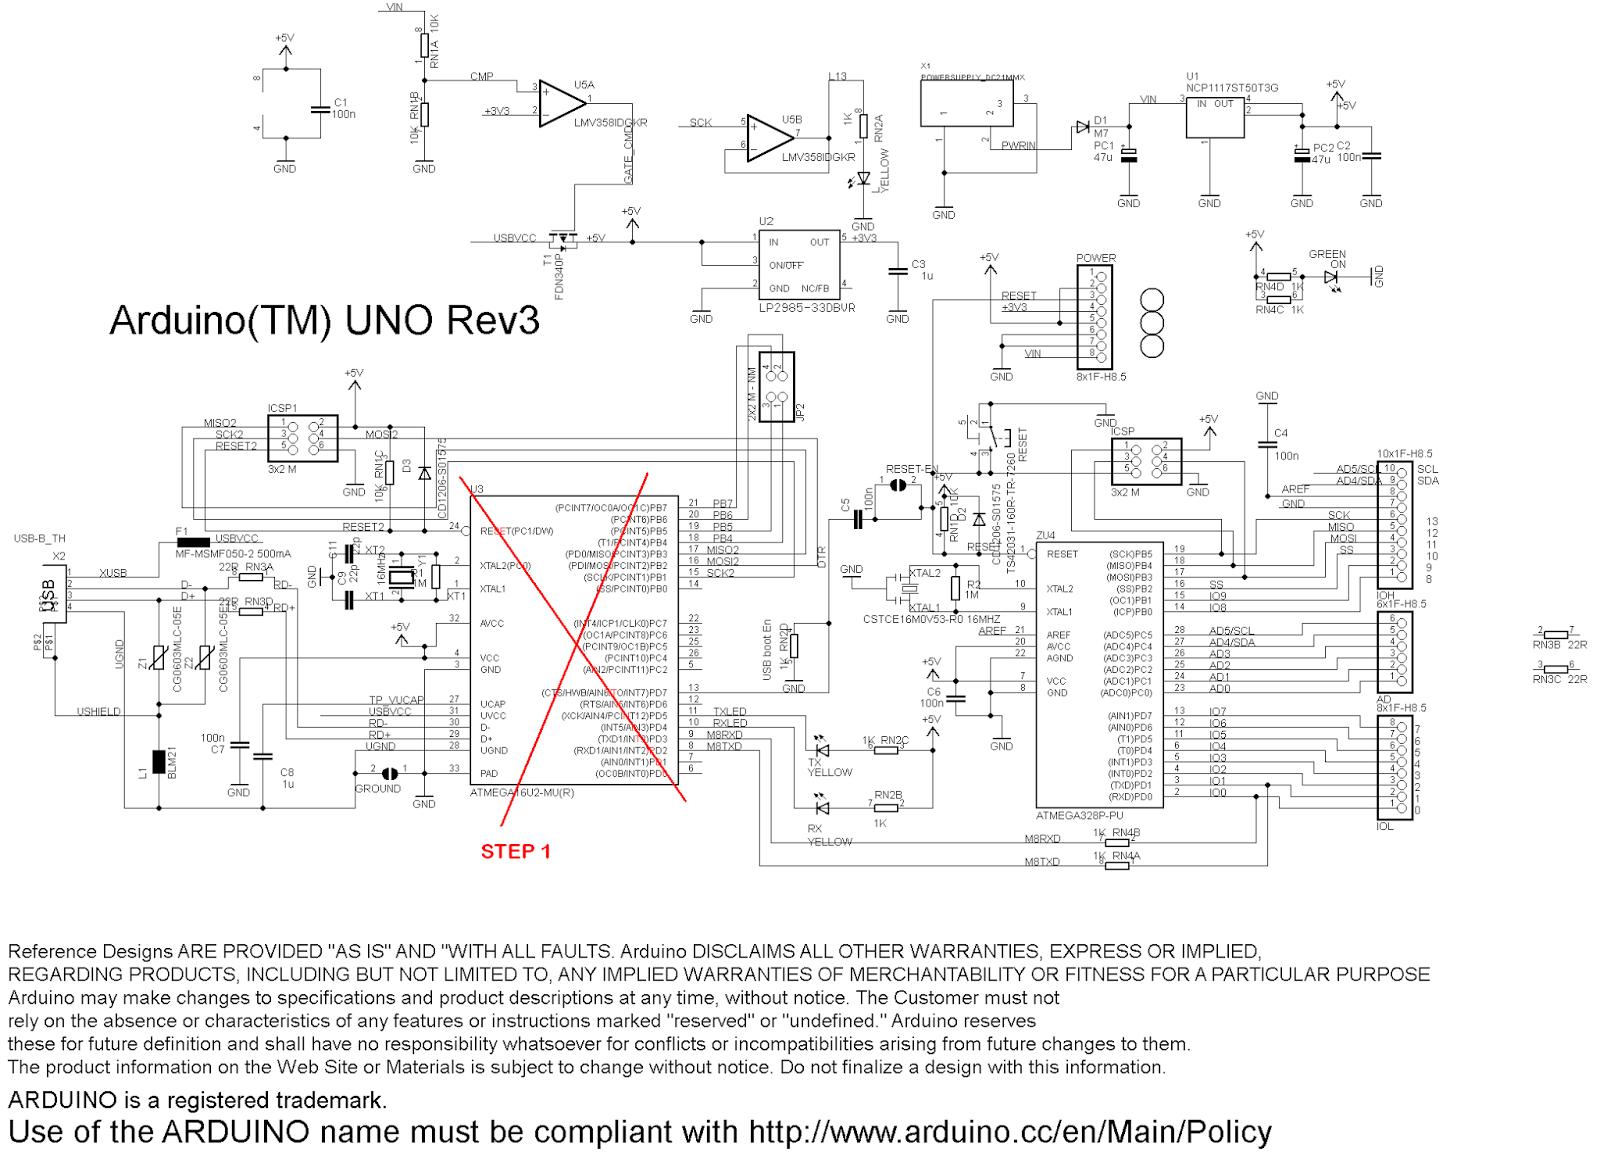 arduino uno r2 schematic pdf